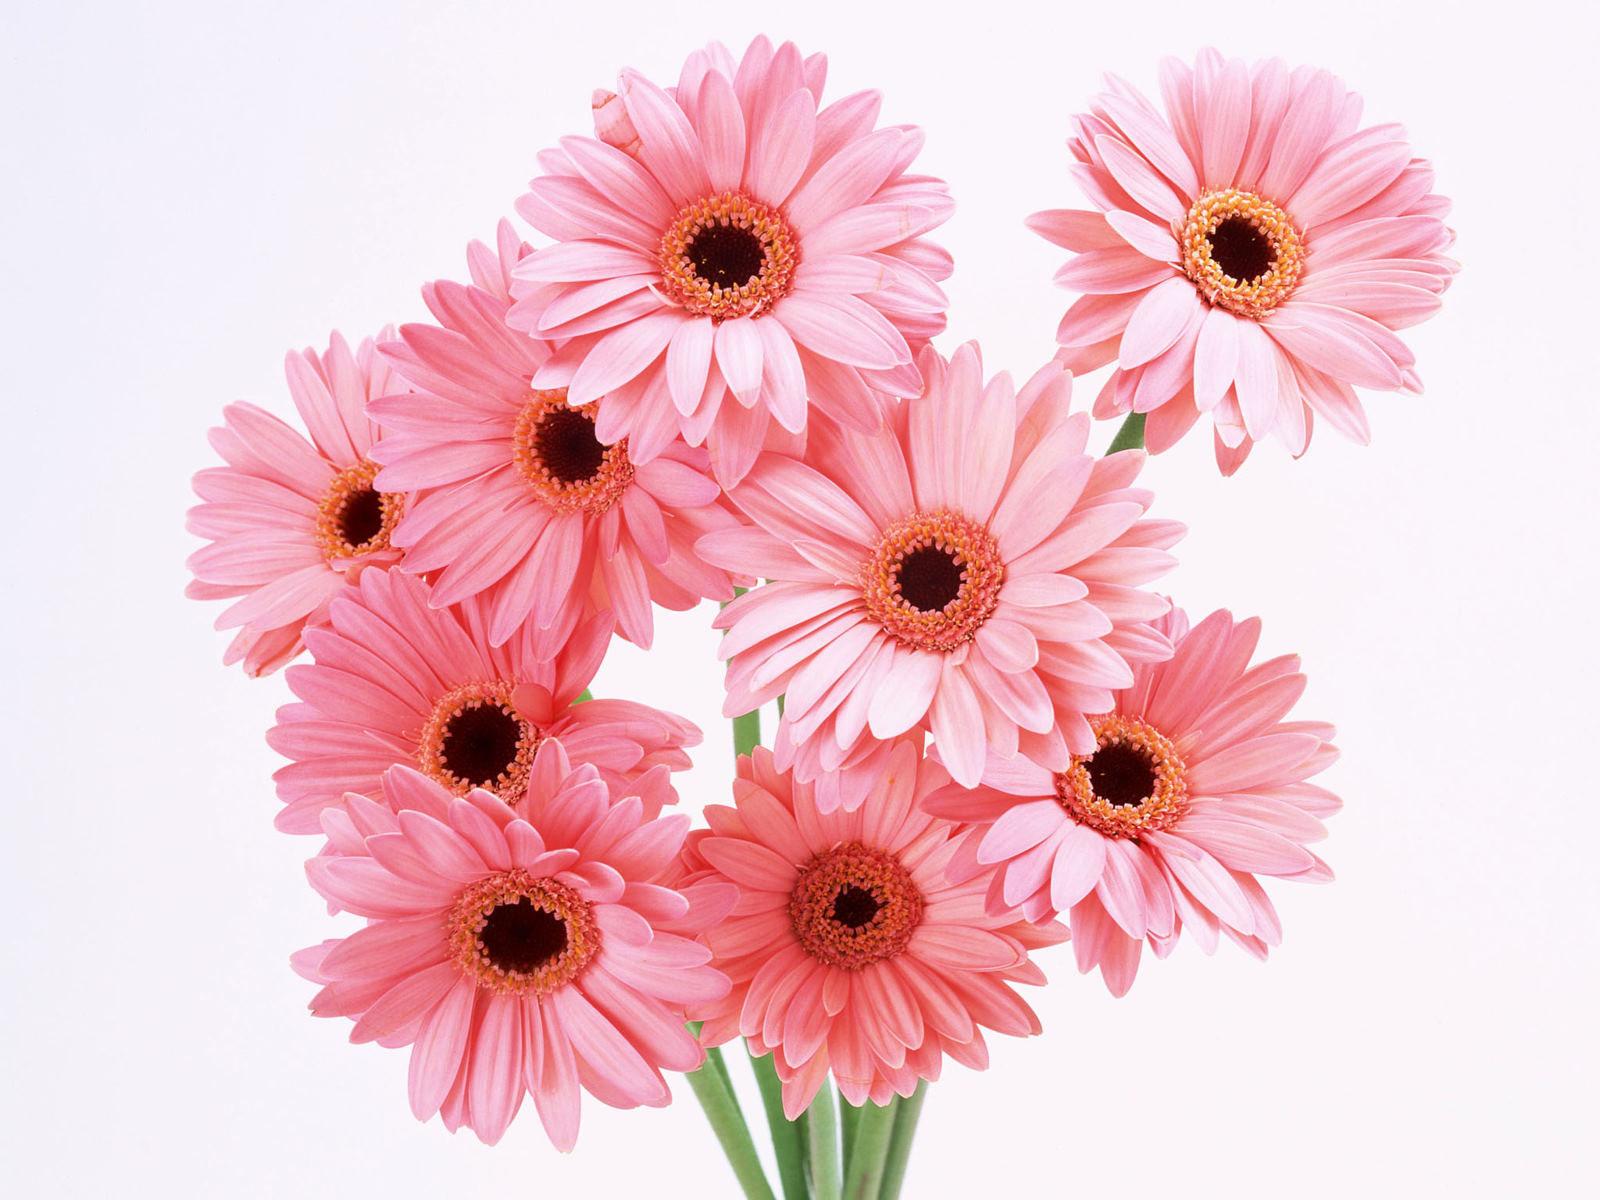 Flowers For Flower Lovers Flowers Wallpapers Hd Desktop Beautiful Back Grounds